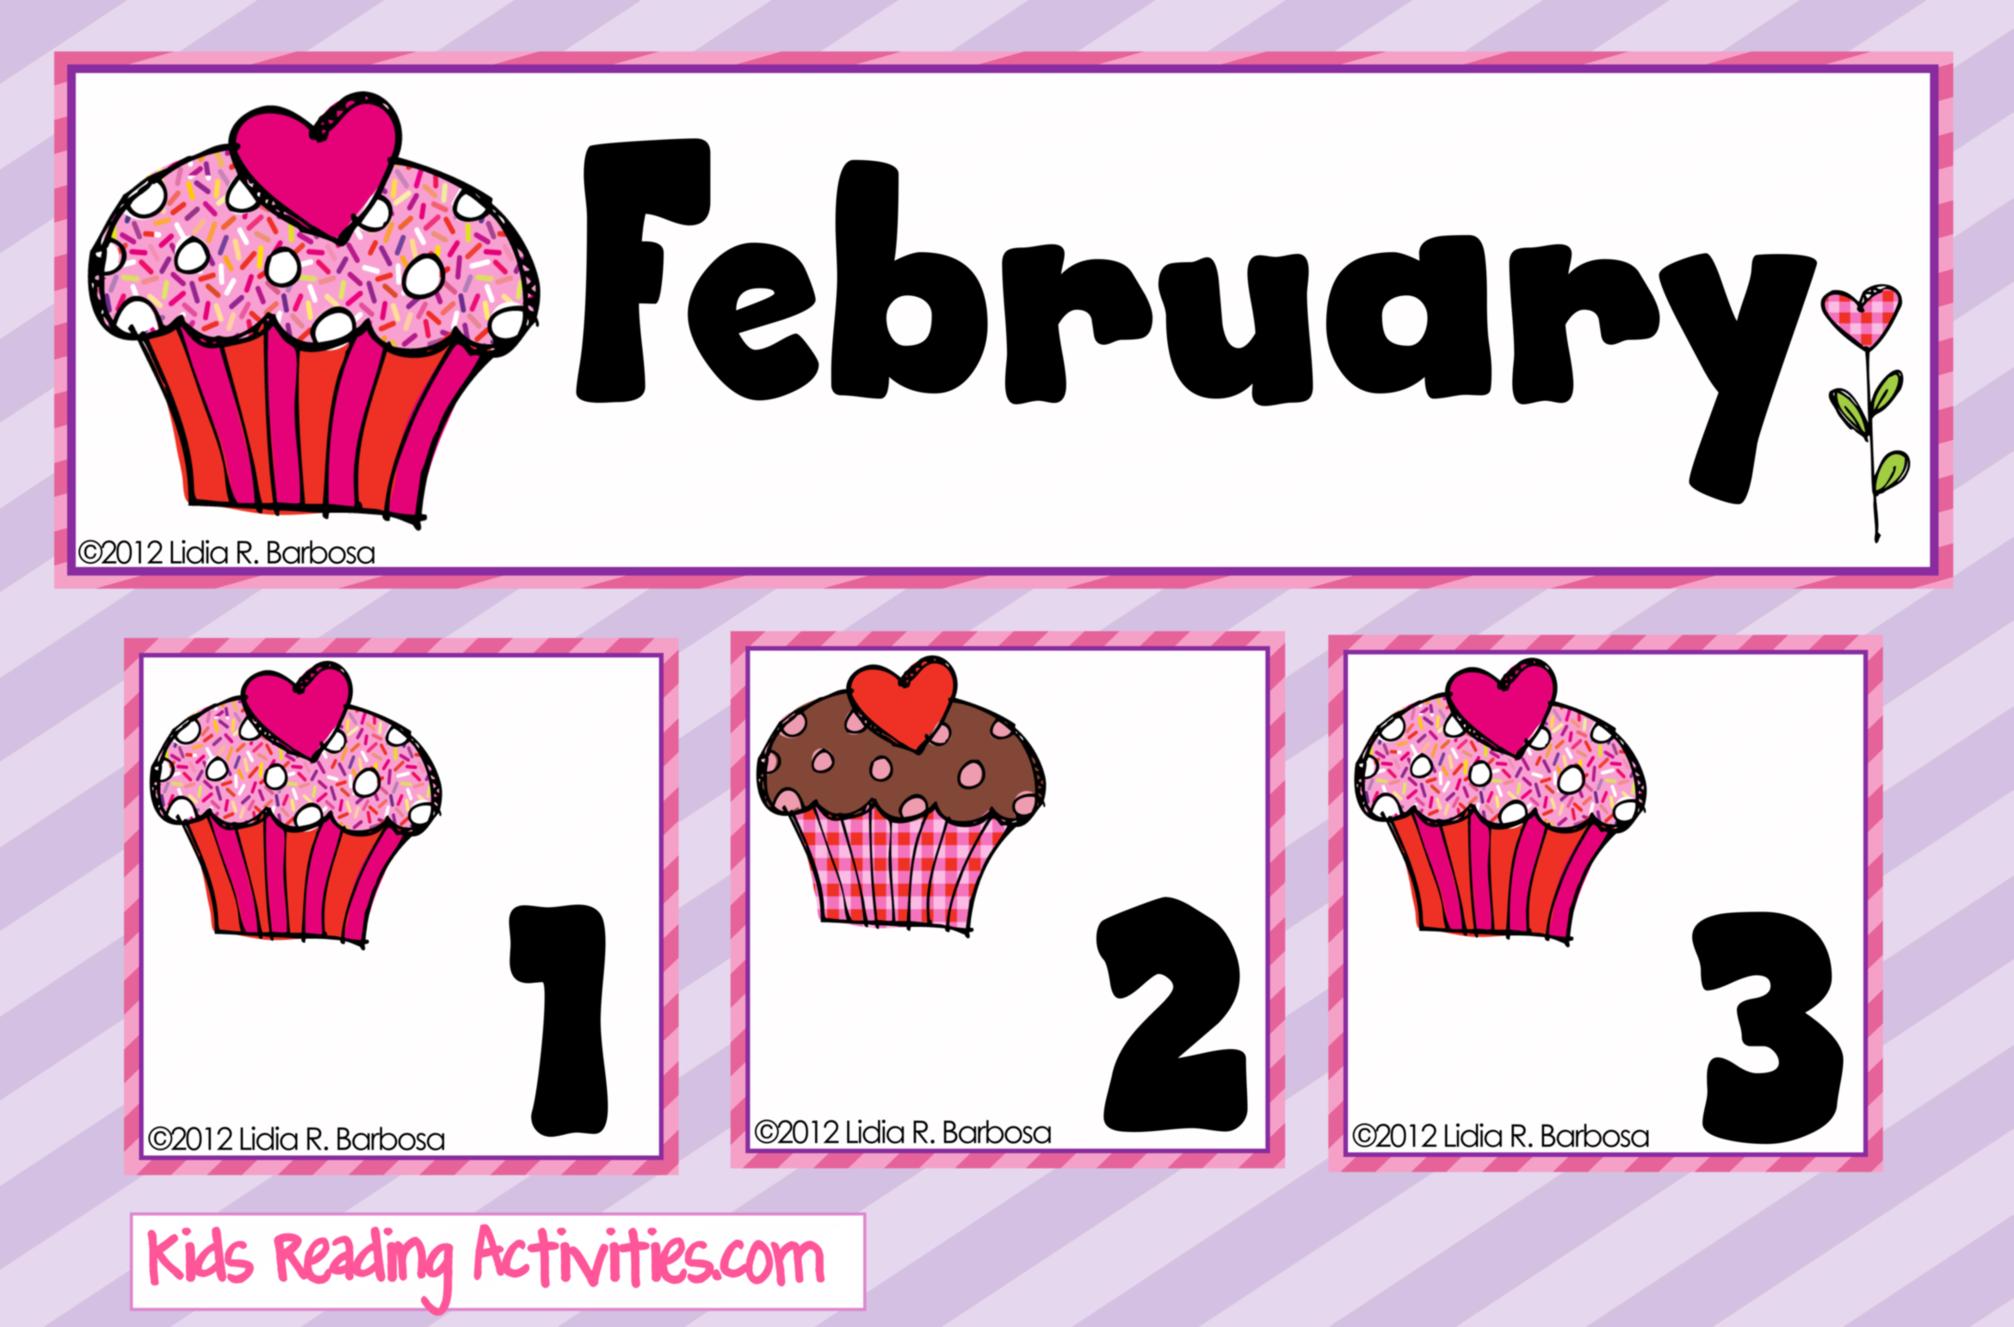 Free Calendar Pieces Strawberry And Chocolate Cupcakes